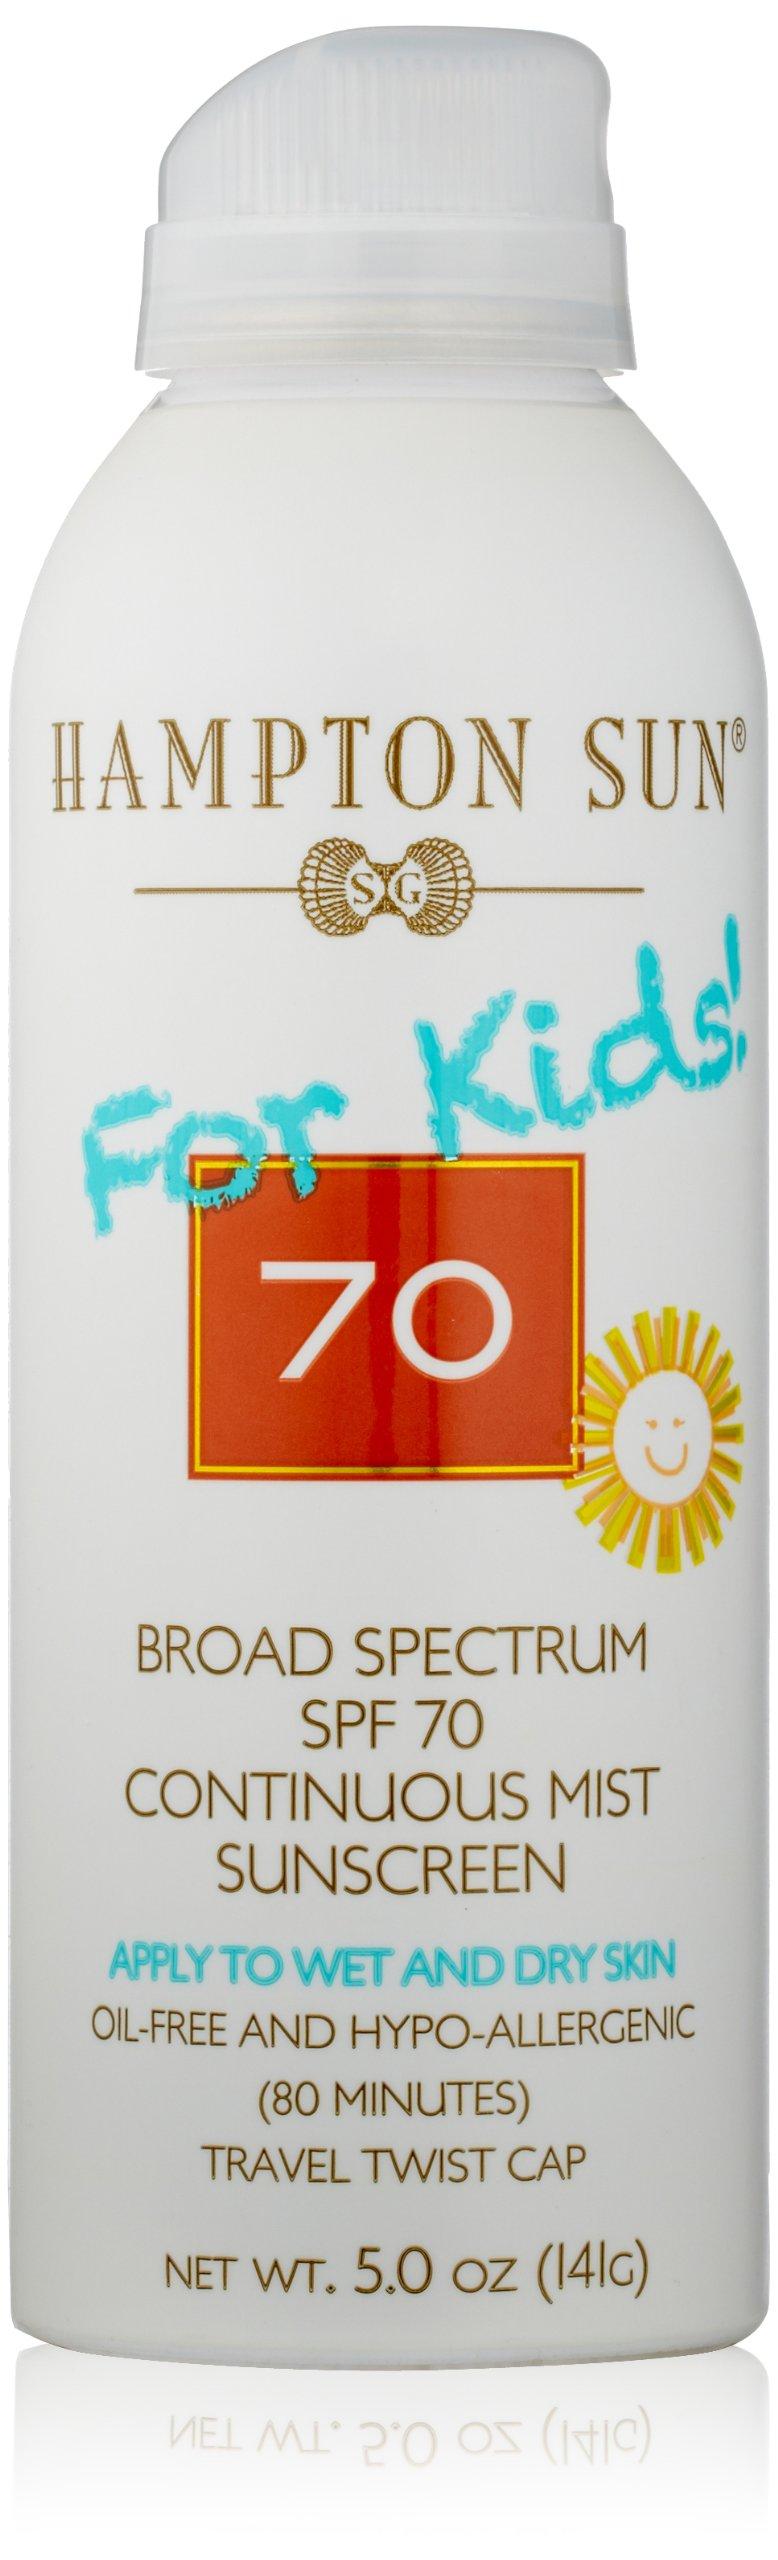 Hampton Sun SPF 70 for Kids Continuous Mist Sunscreen, 5 Oz by Hampton Sun